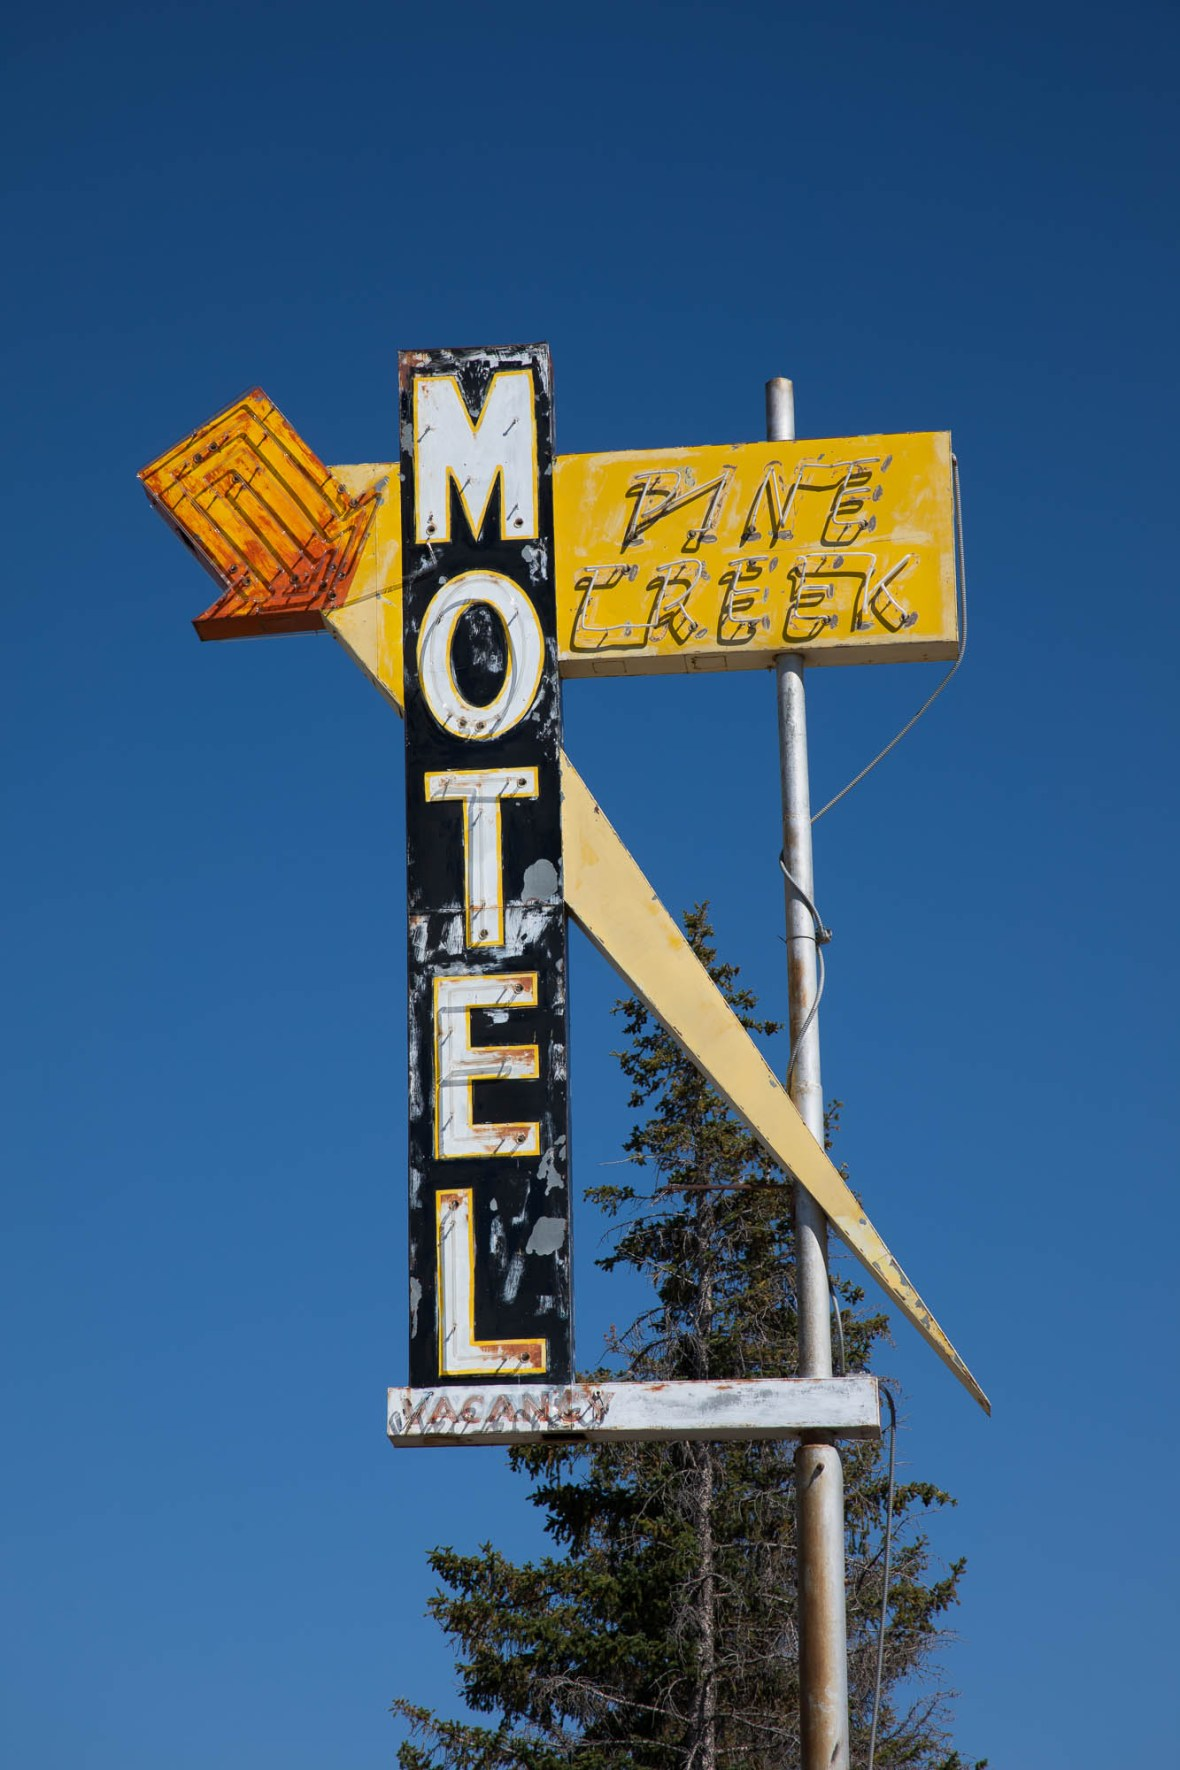 Pine Creek Motel - Pinedale, Wyoming U.S.A. - August 29, 2018